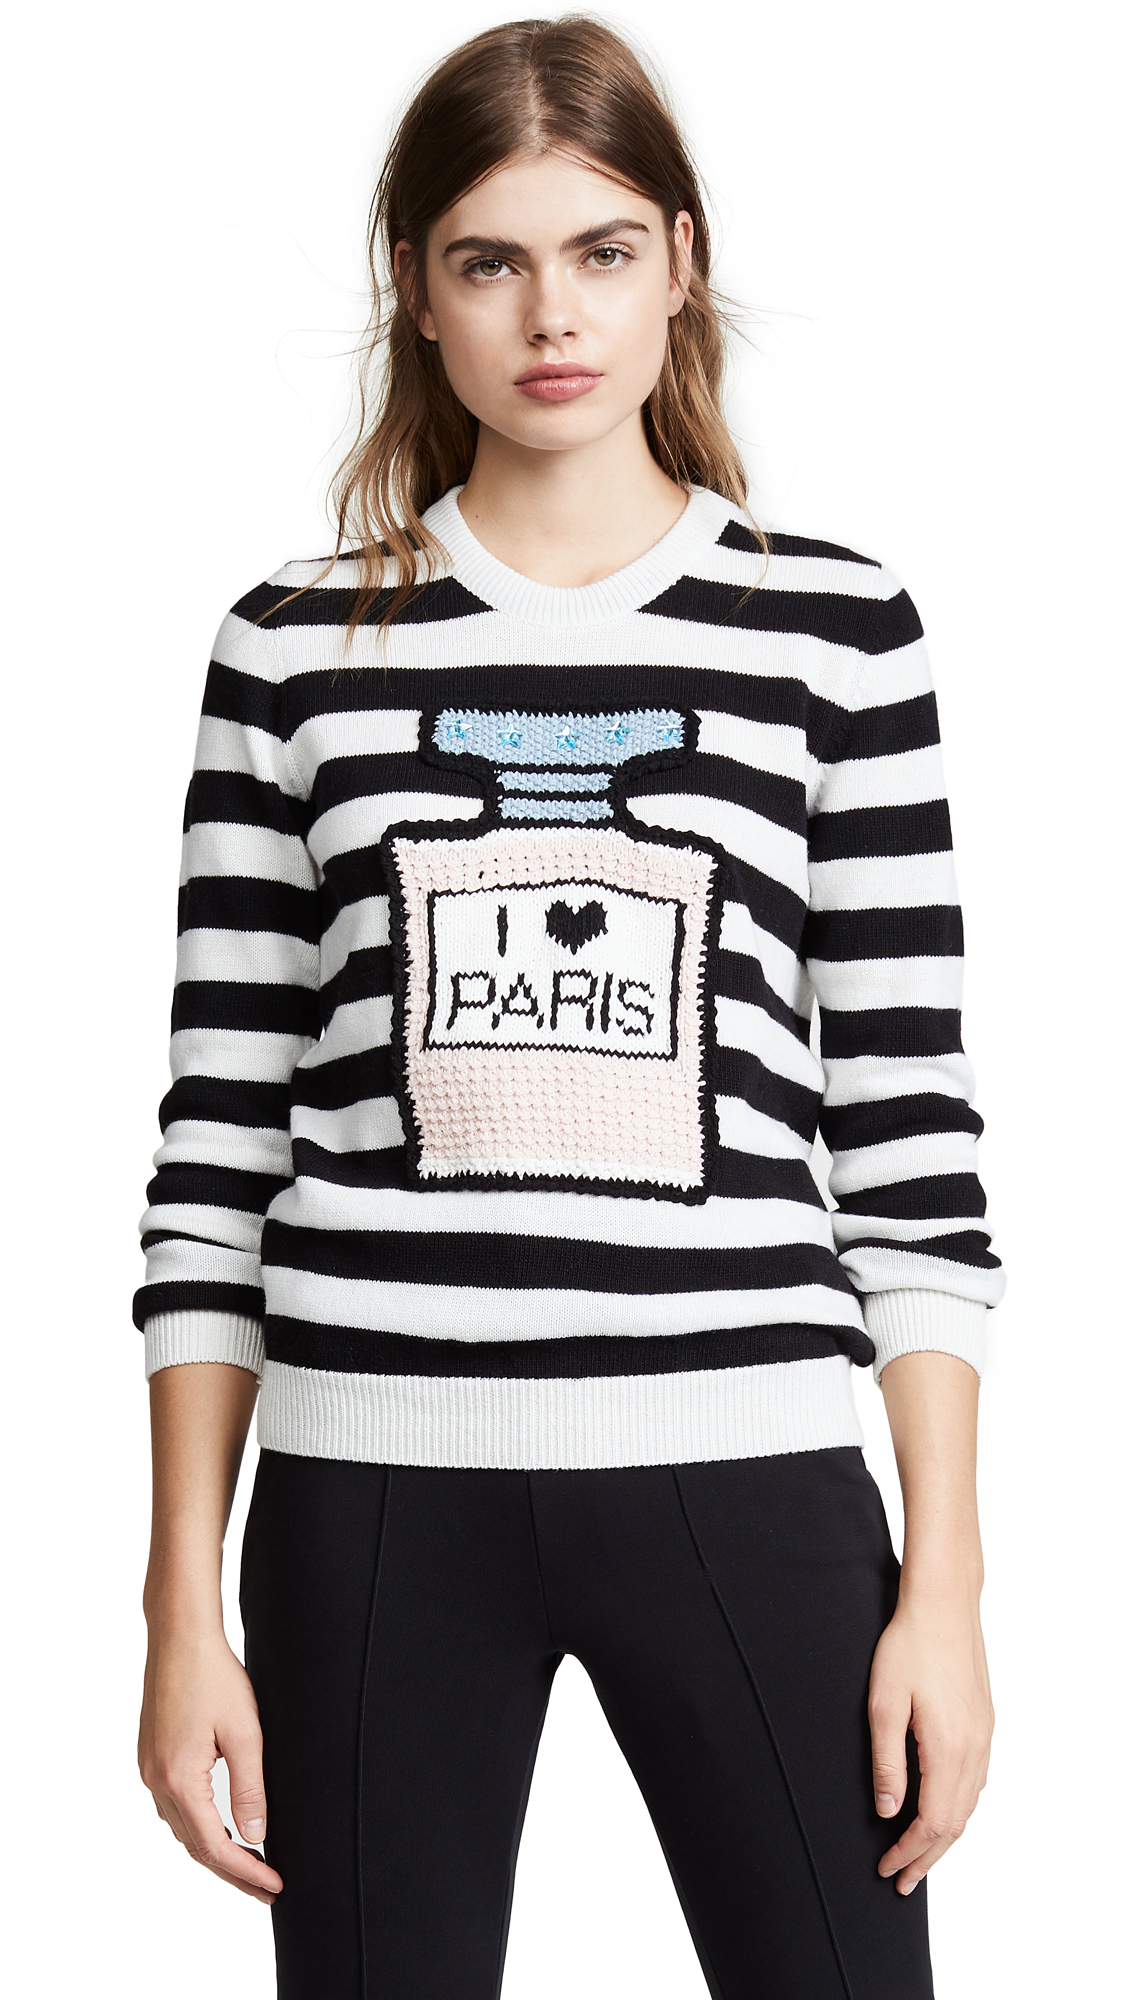 Michaela Buerger I Love Paris Striped Sweater In Black/White Stripe